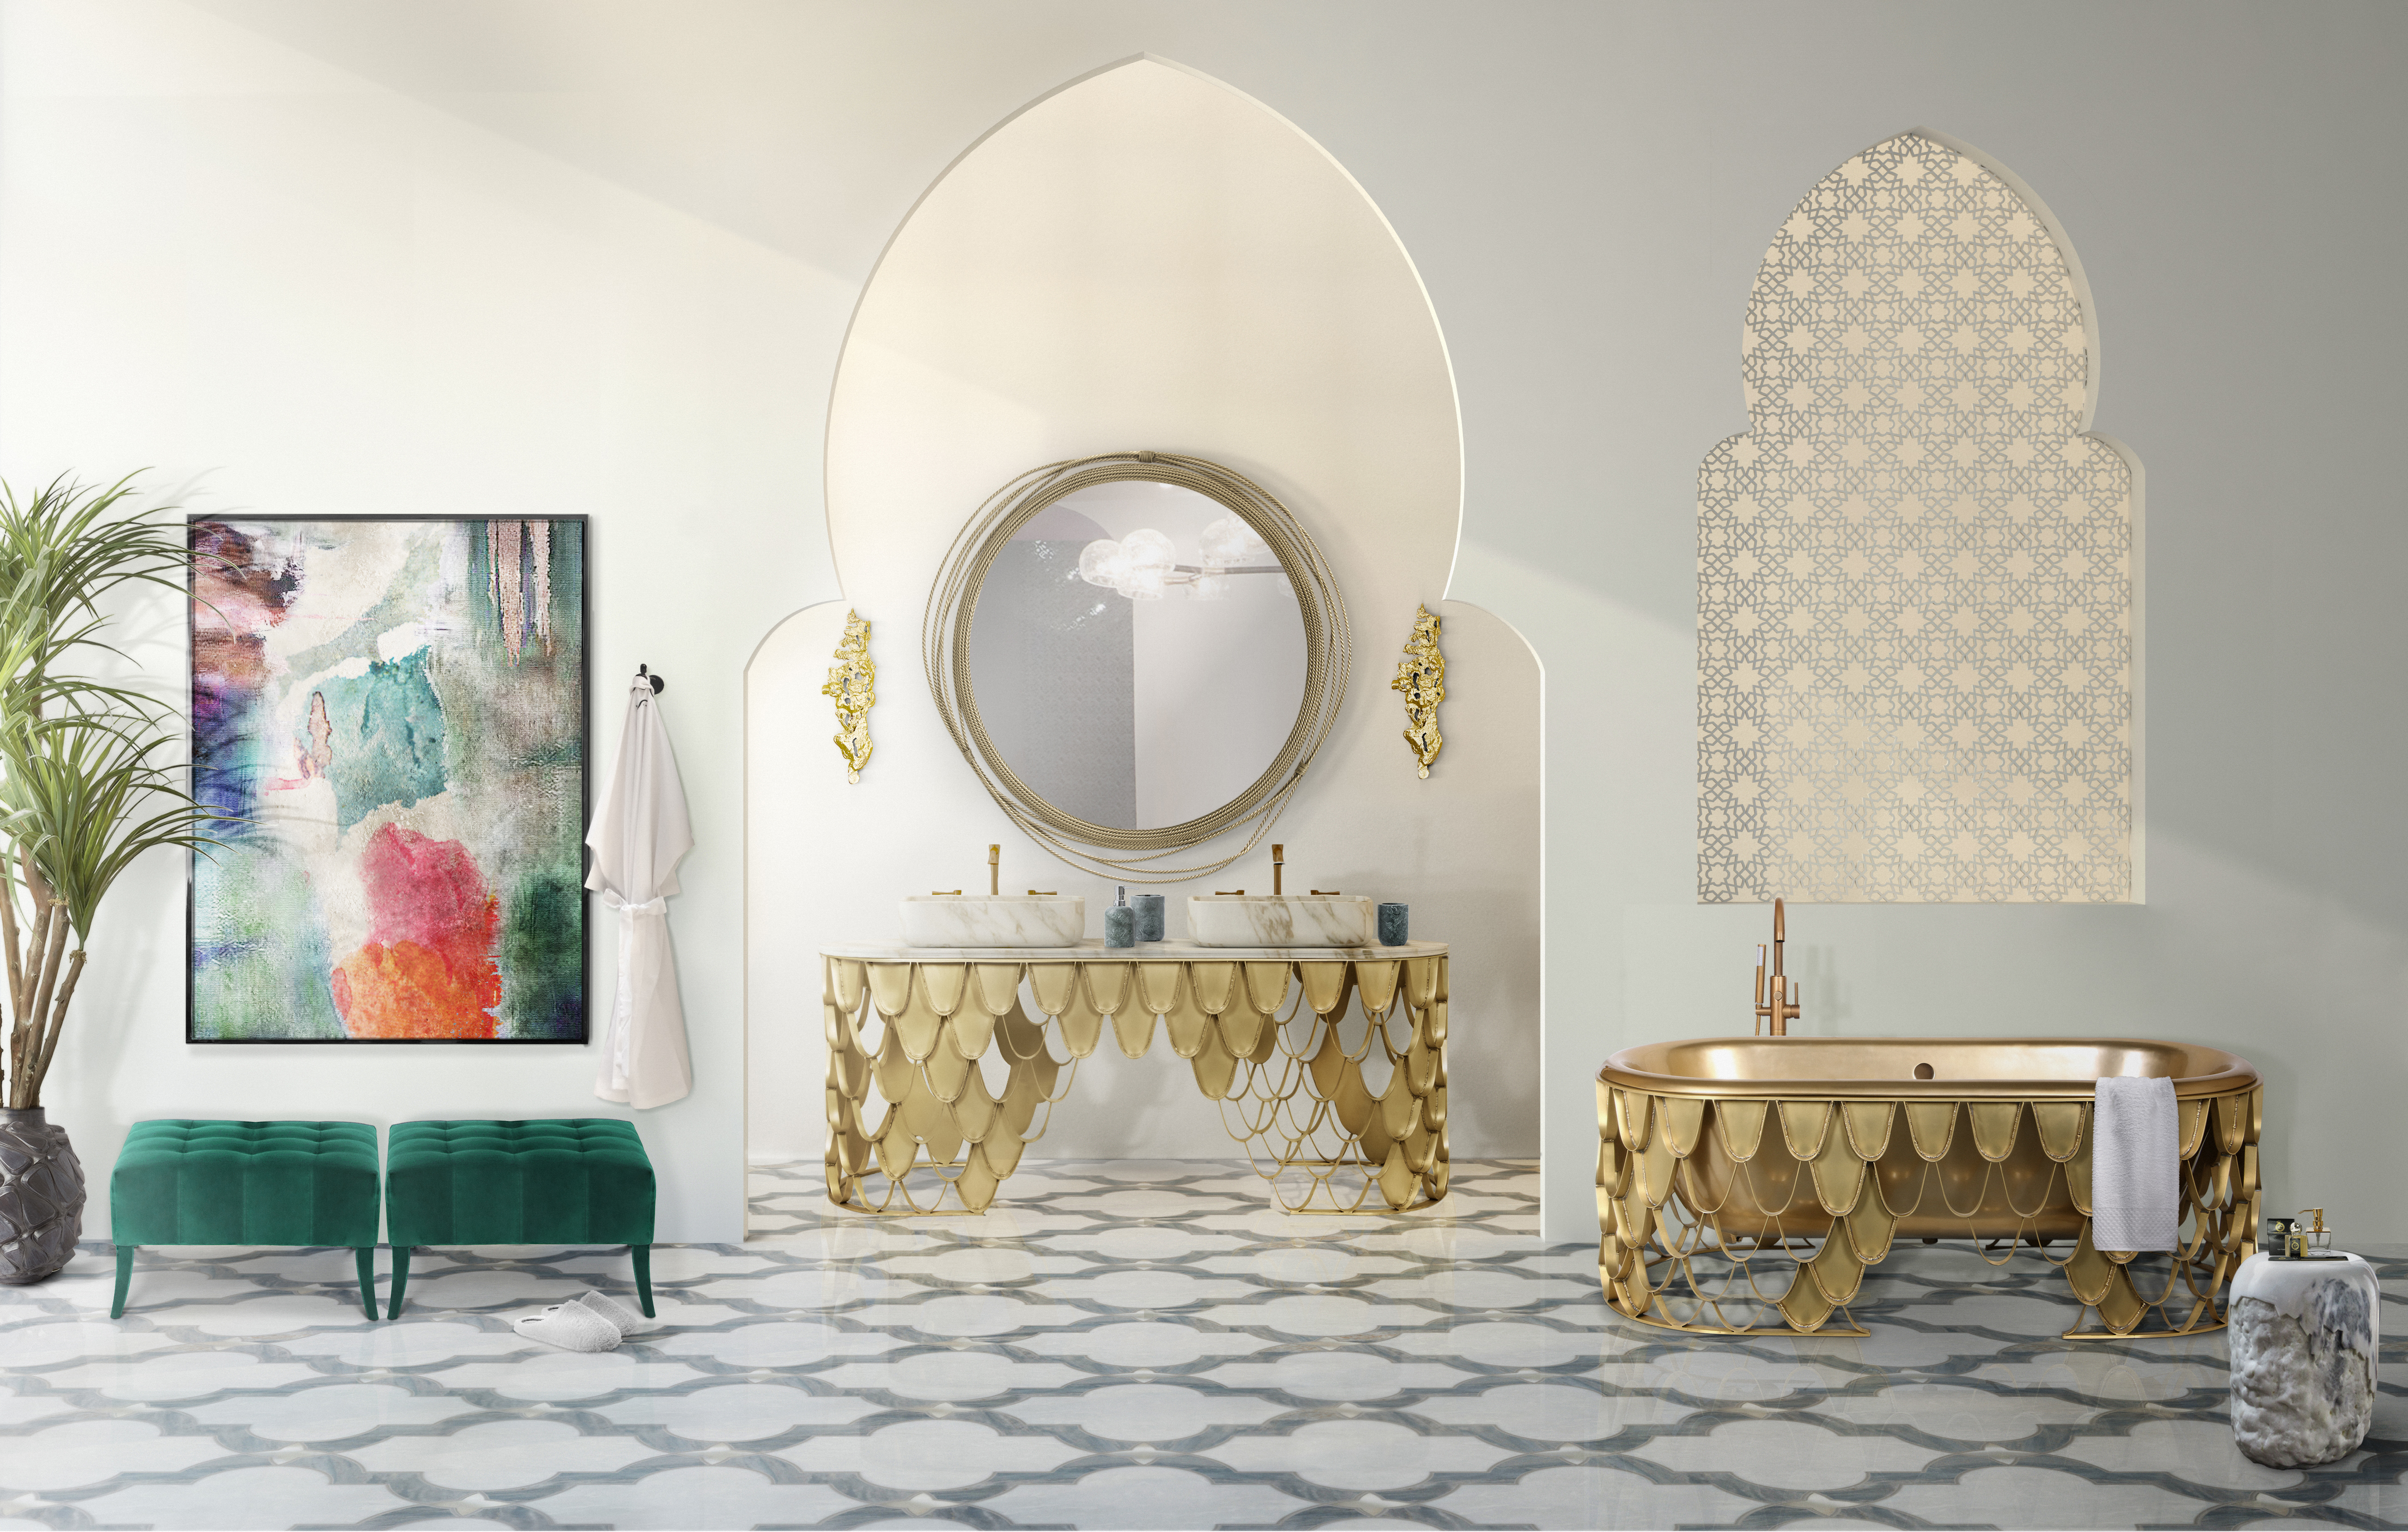 5 spectacular bathroom mirrors 5 Spectacular Bathroom Mirrors That Will Delight You 30 koi washbasin koi bathtub 1 HR 1